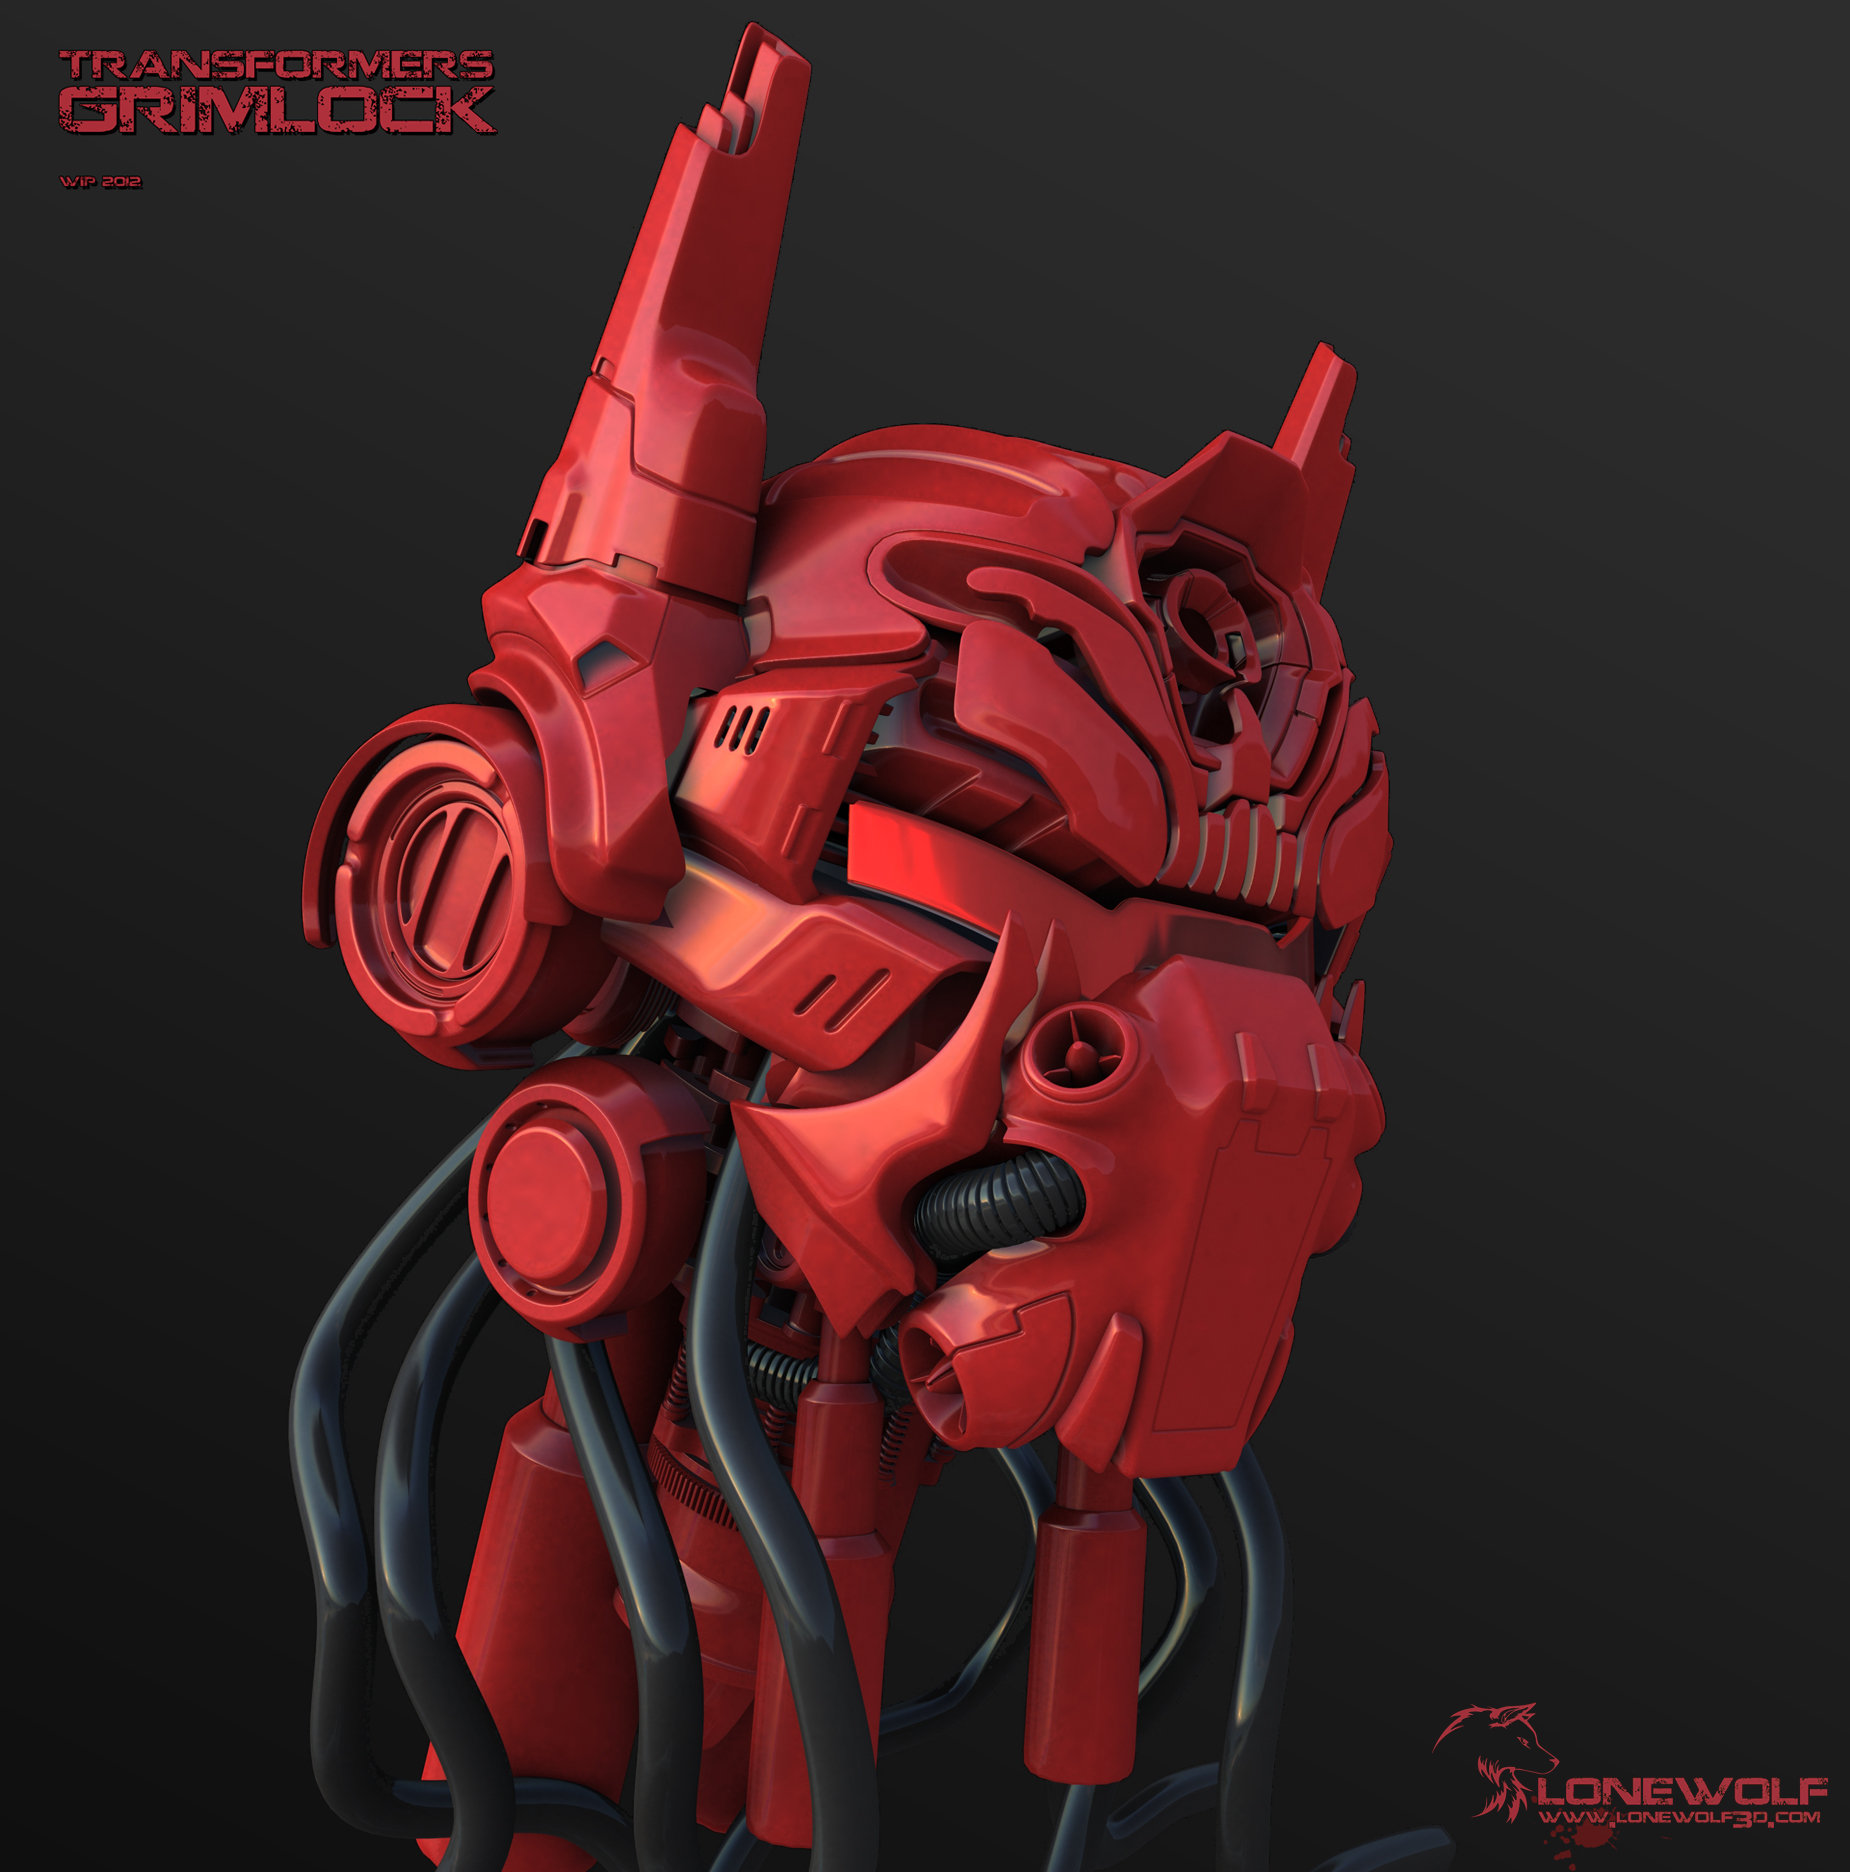 Grimlock transformers tf4 04